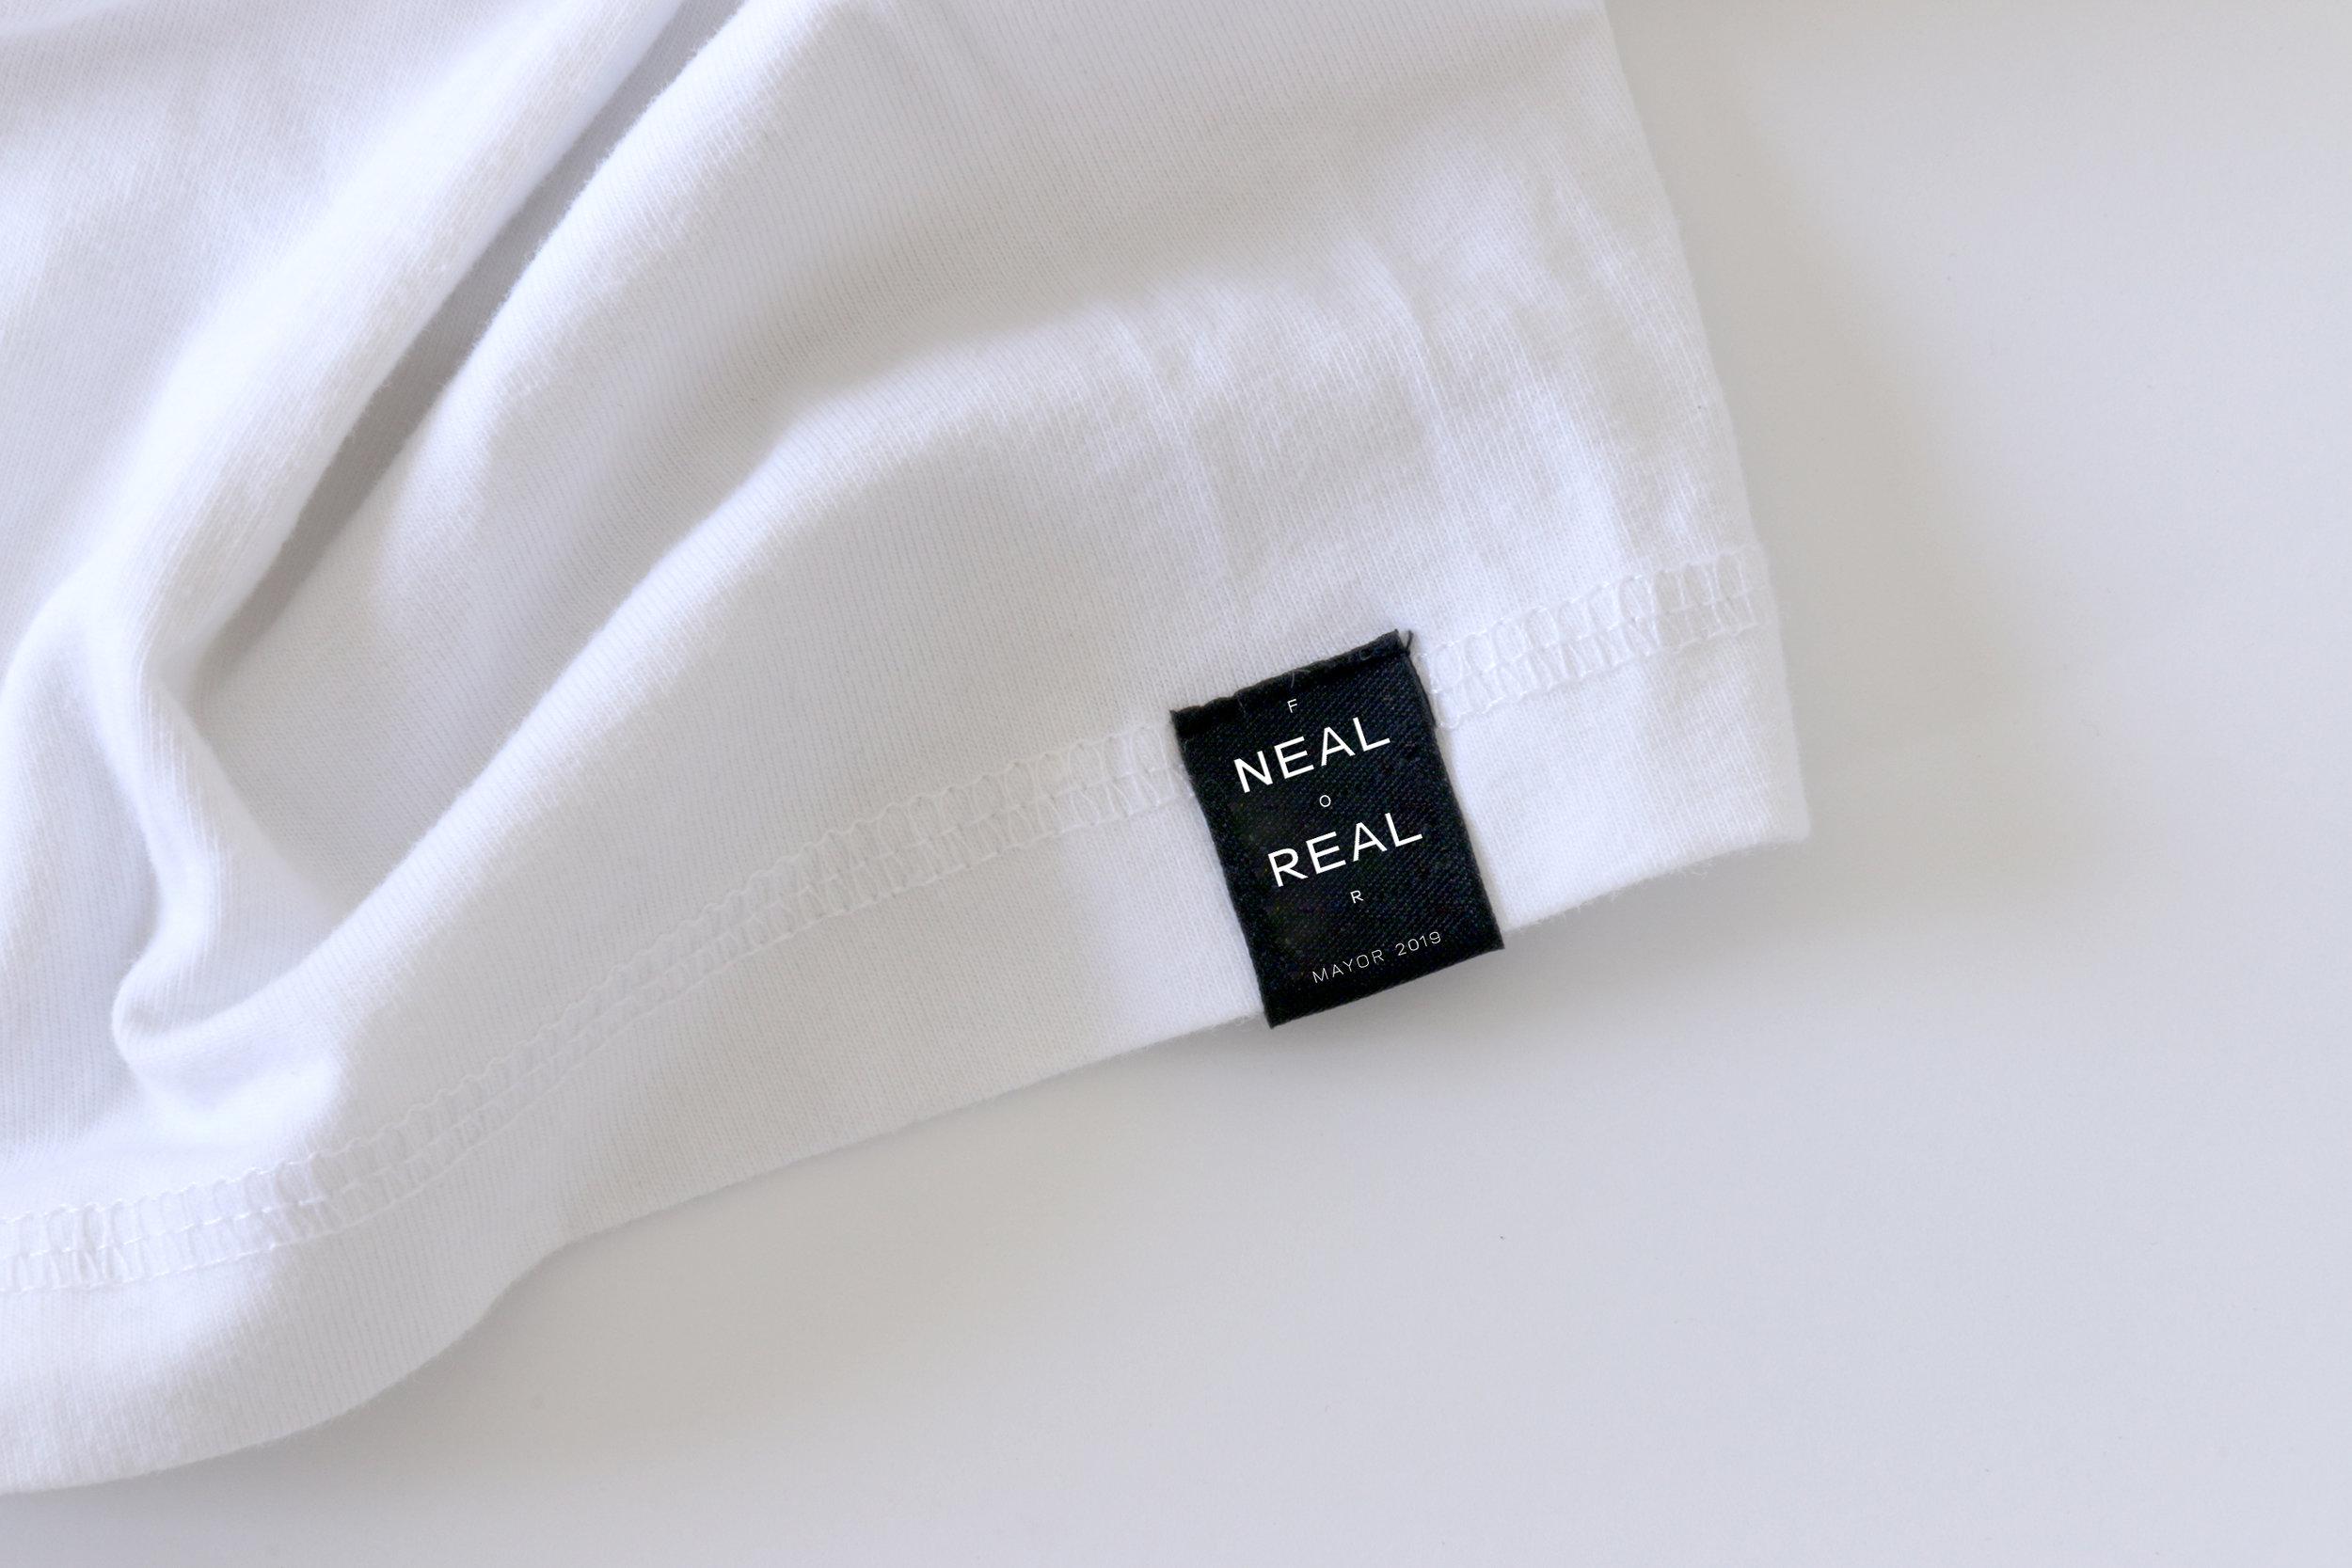 3D_shirt_label_3000w.jpg